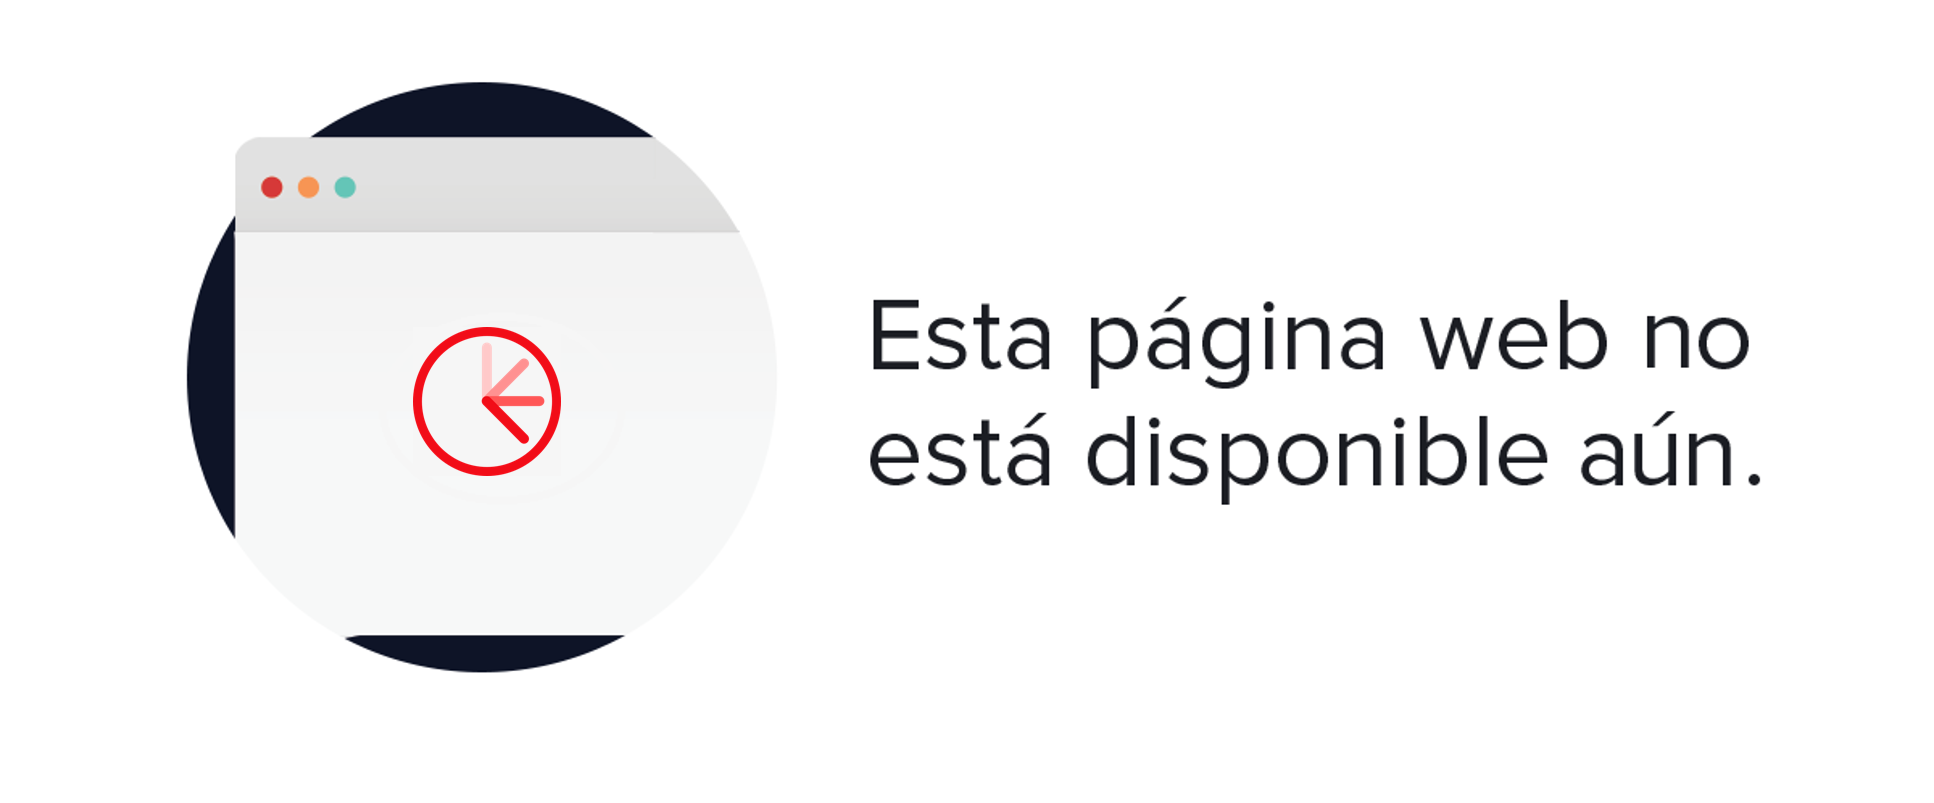 Philipp Plein Camiseta Con Estampado De Cordones Plein  81881632